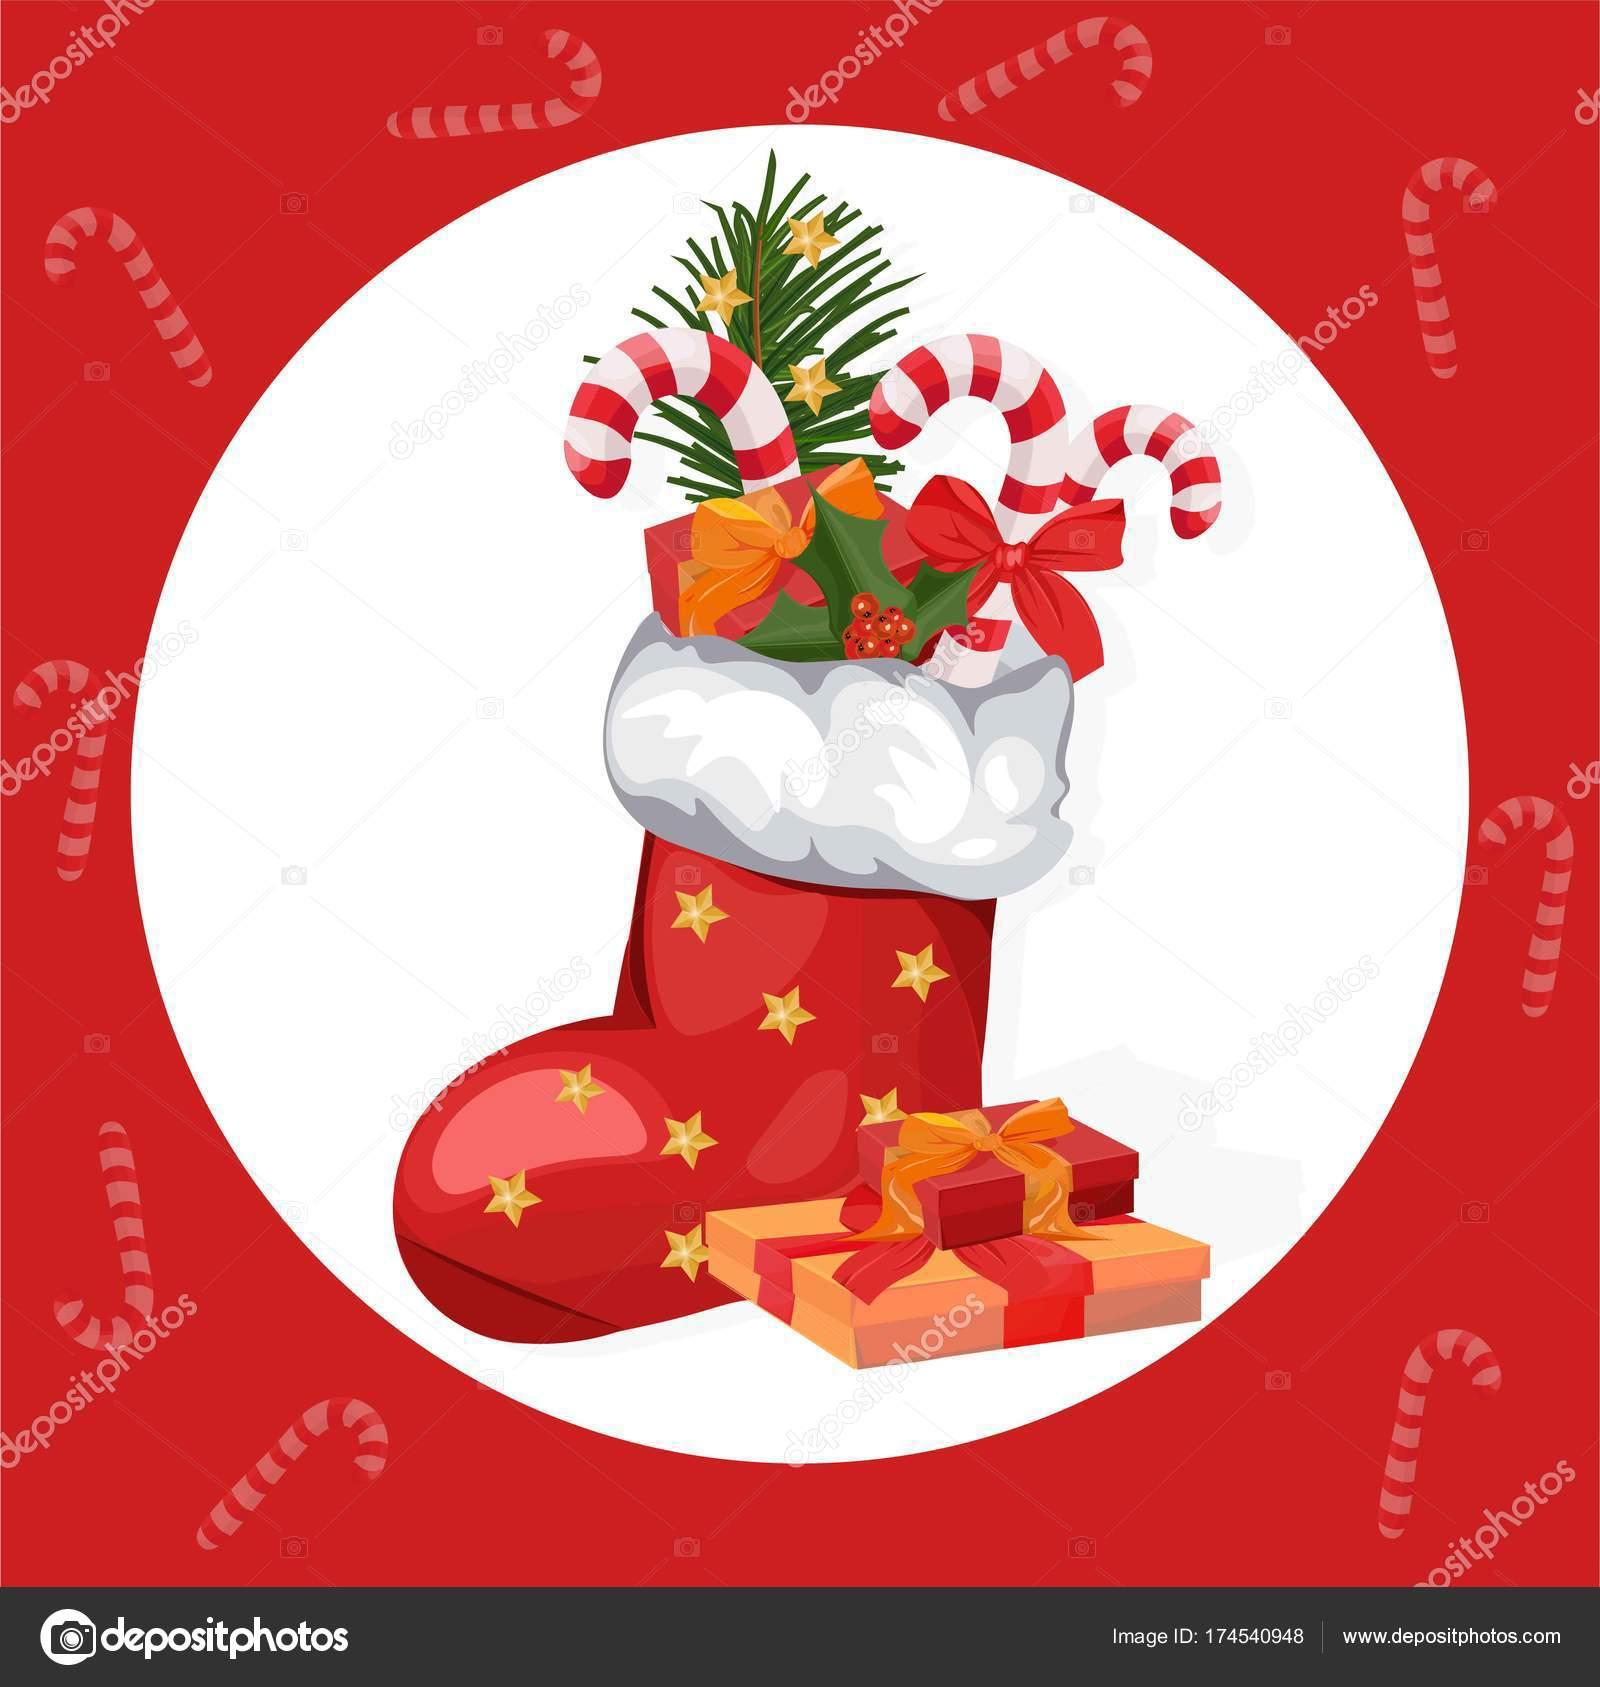 Christmas Holidays Icon.Christmas Socks Vector Happy Holidays Icon Red Santa Sock